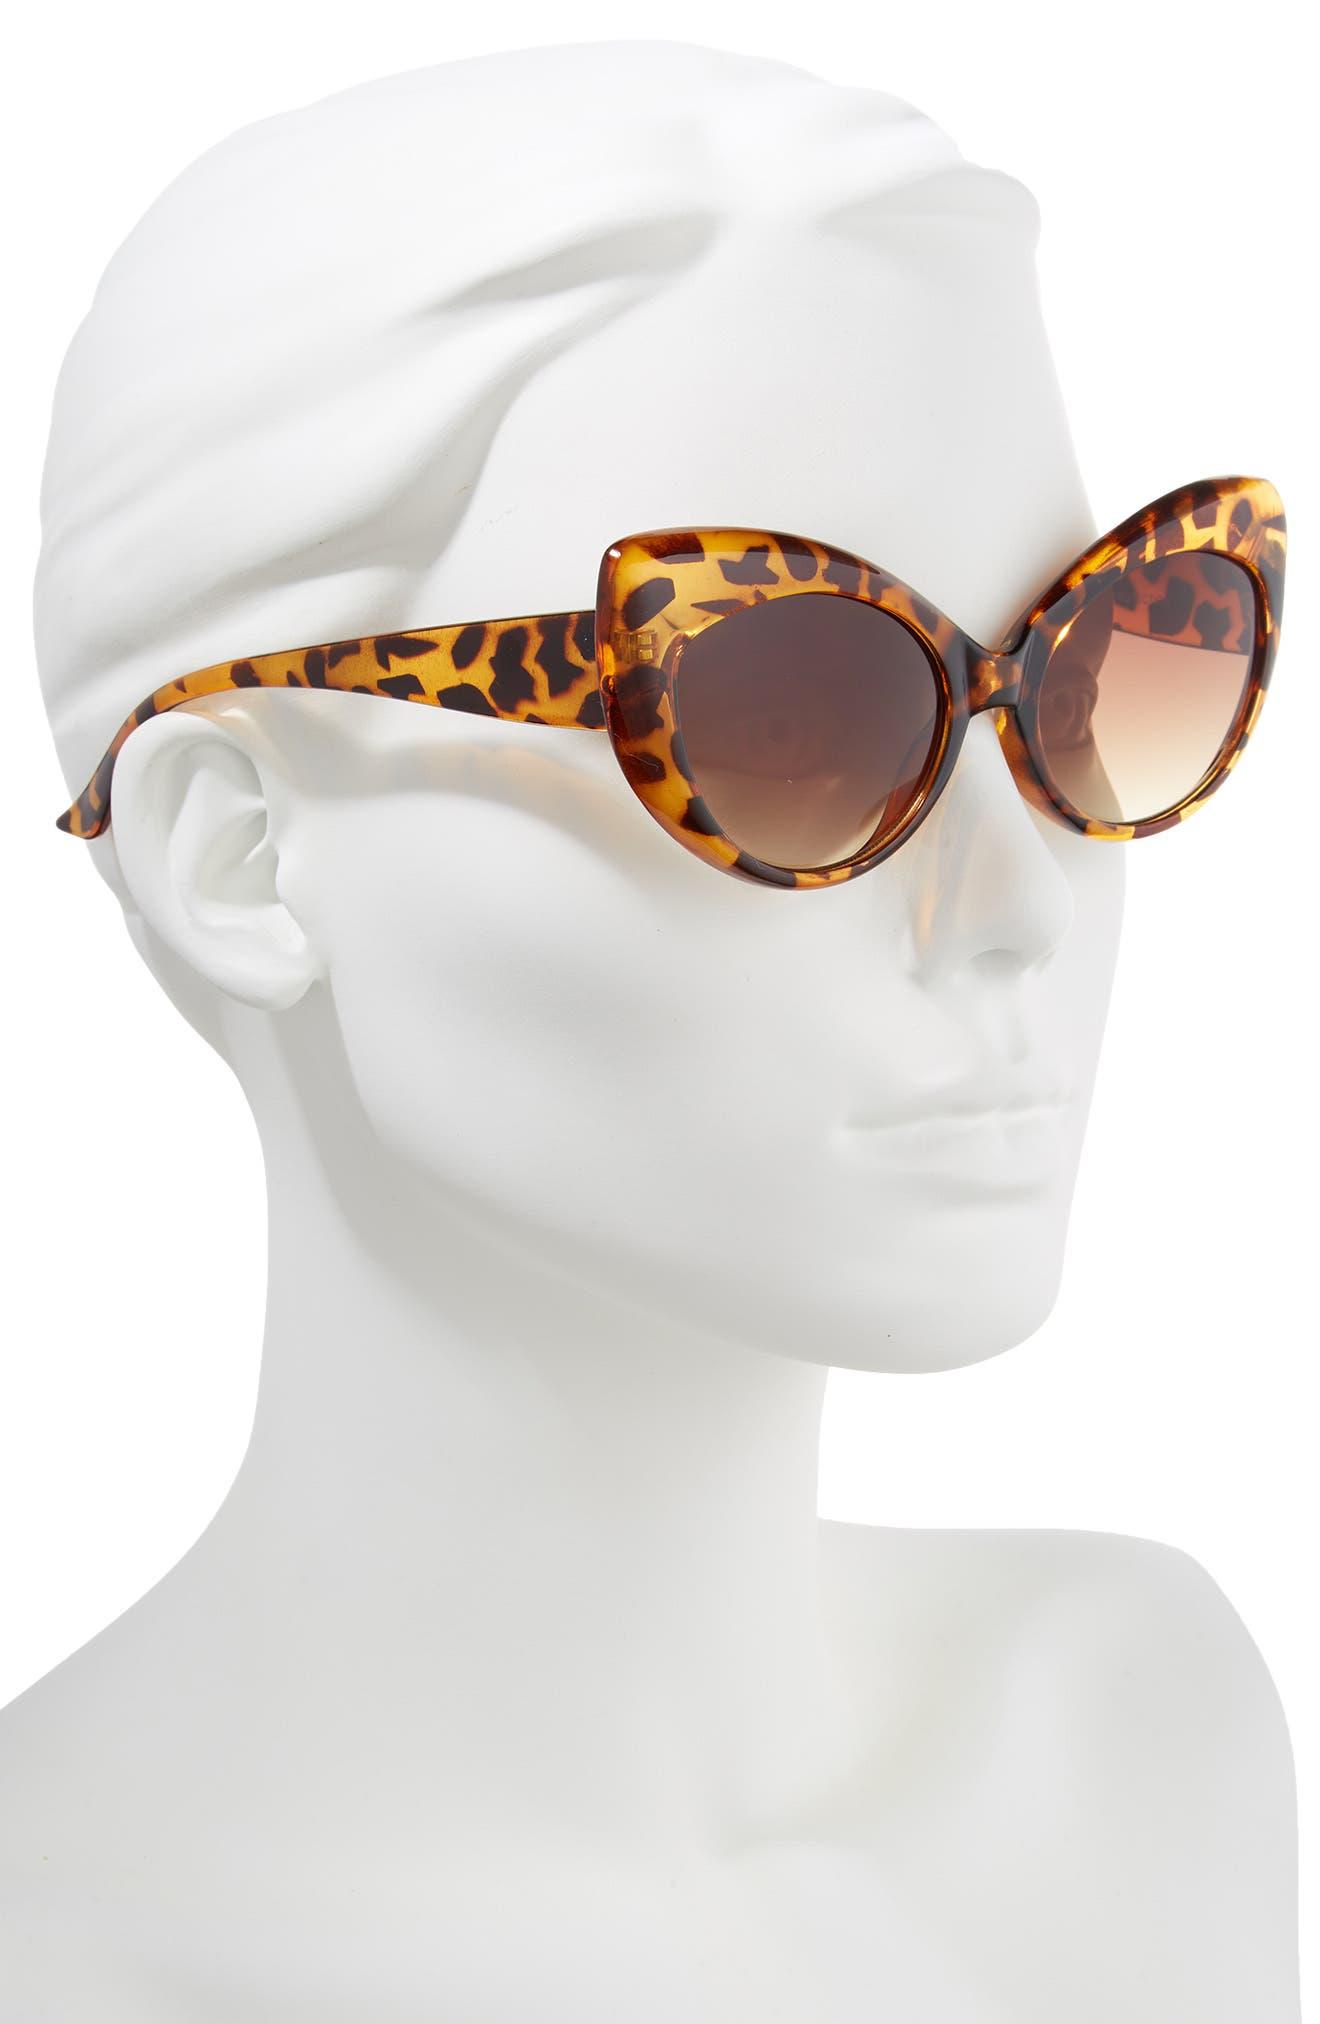 57mm Cheetah Pattern Cat Eye Sunglasses,                             Alternate thumbnail 2, color,                             200